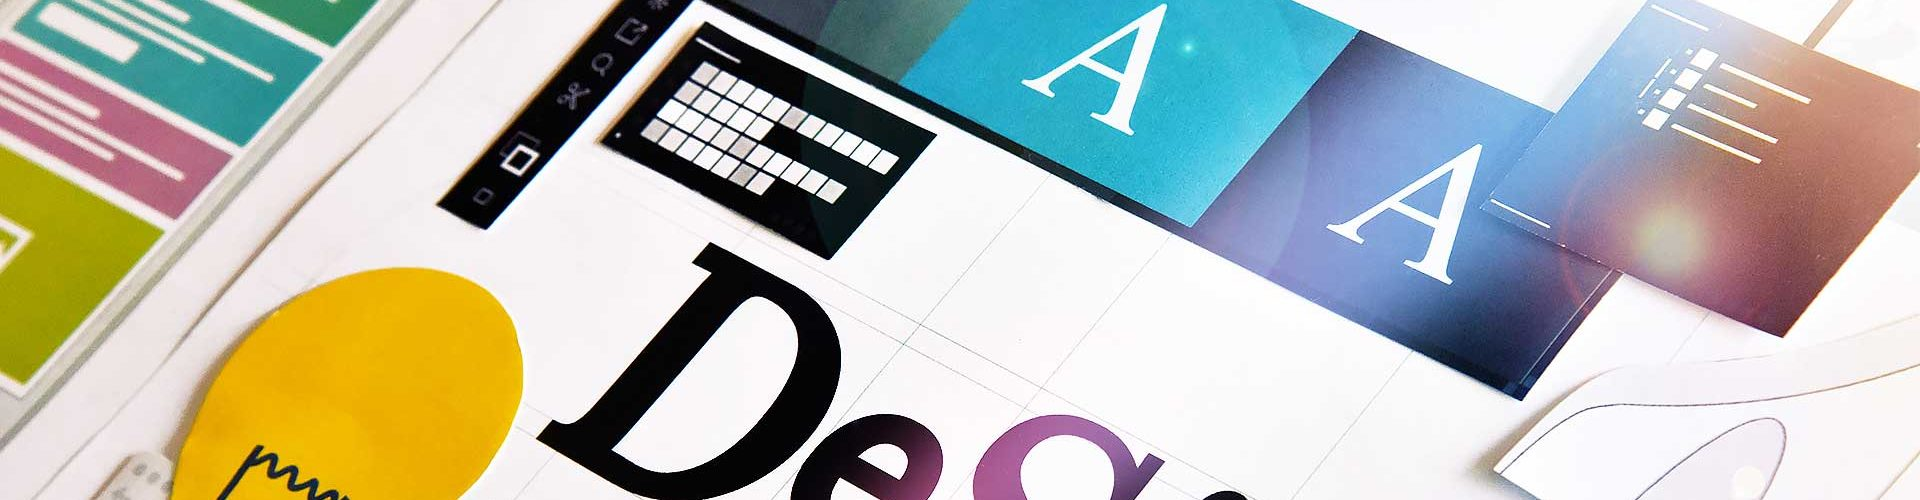 Corporate Identity danne rygraden i virksomhedens markedsføring